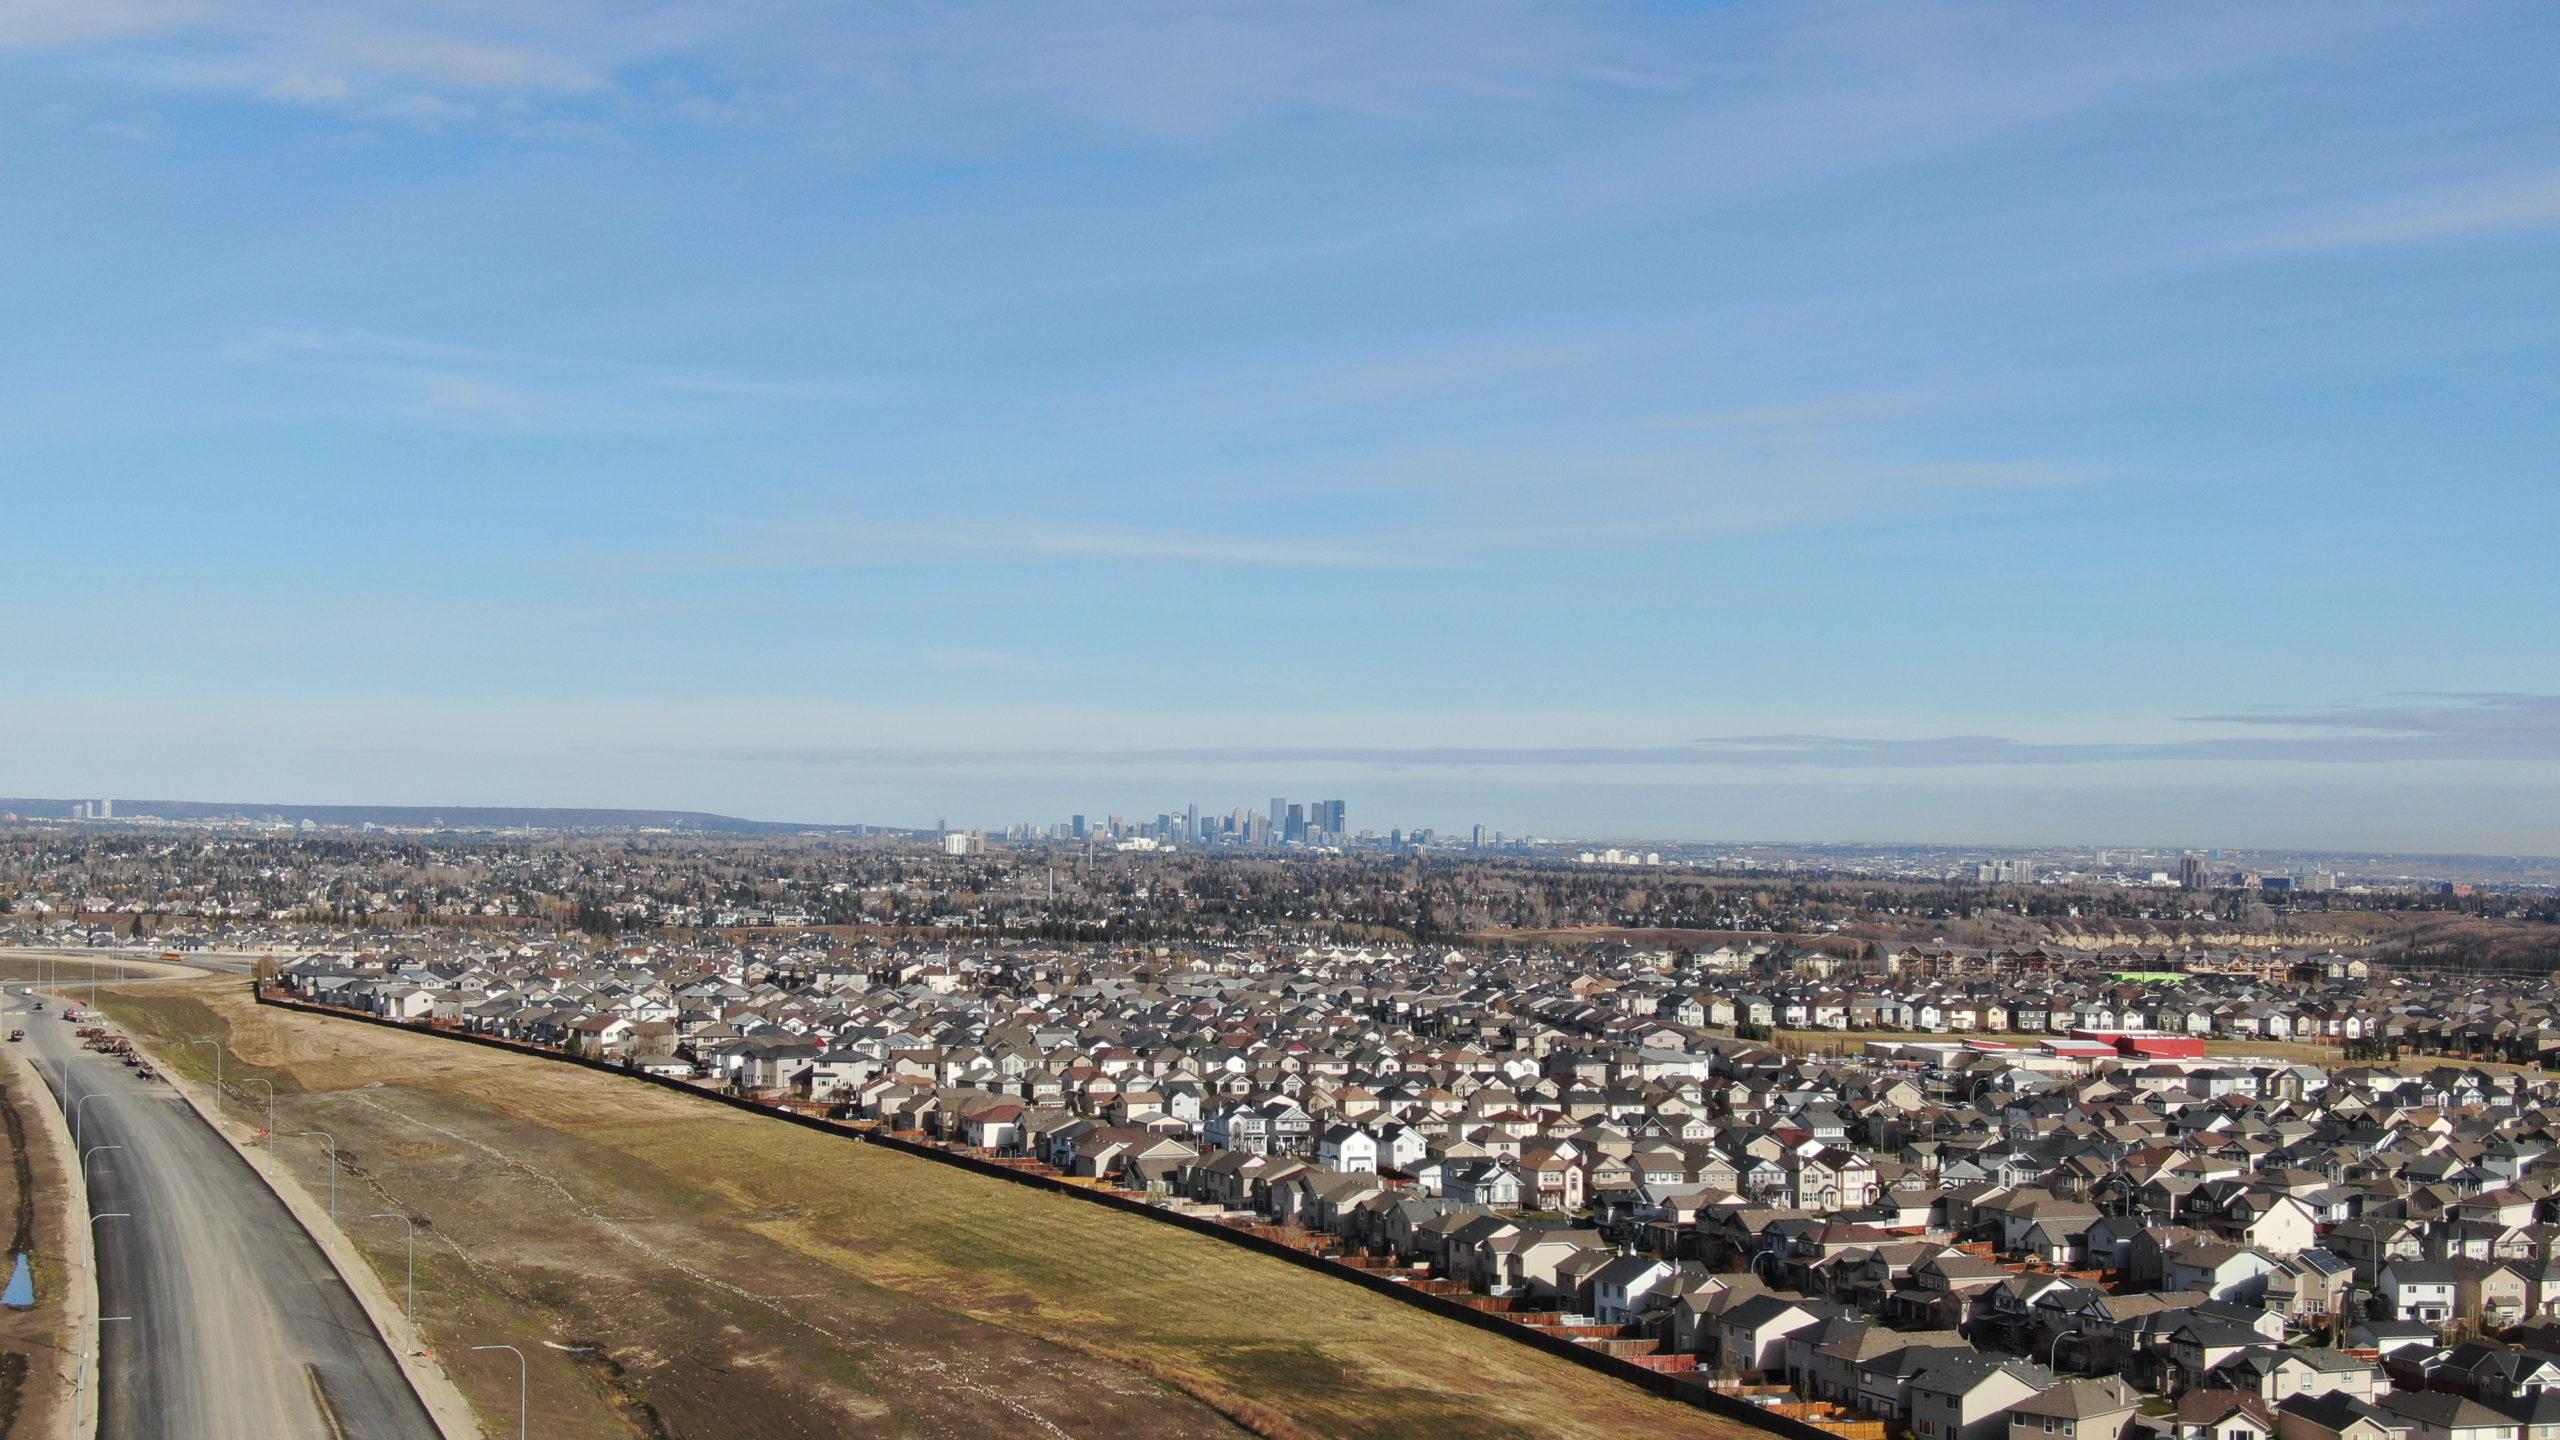 view of suburbs outside of Calgary Alberta